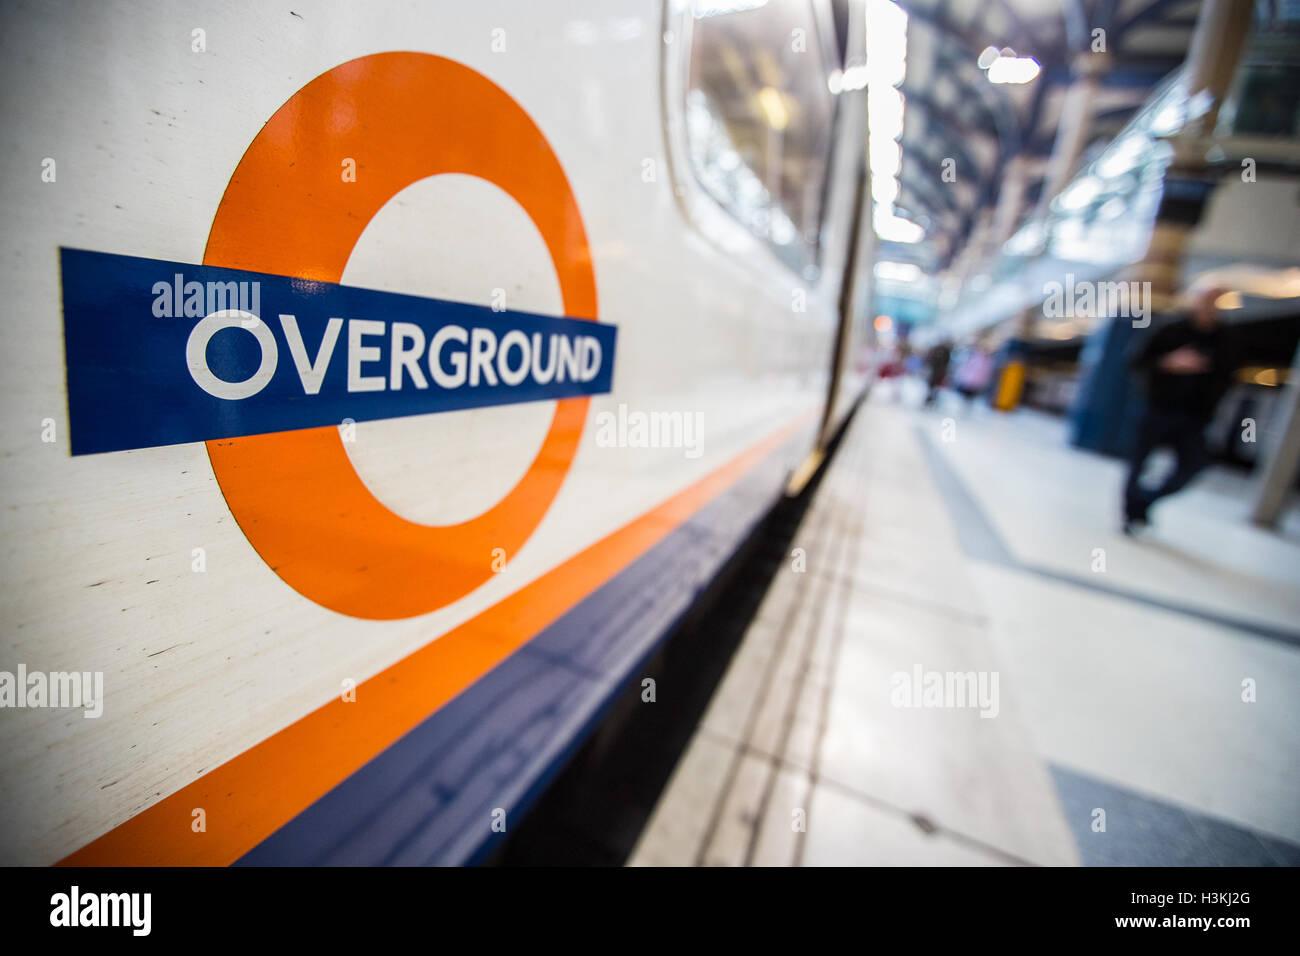 London Overground Railway Logo at Liverpool Street Station - Stock Image